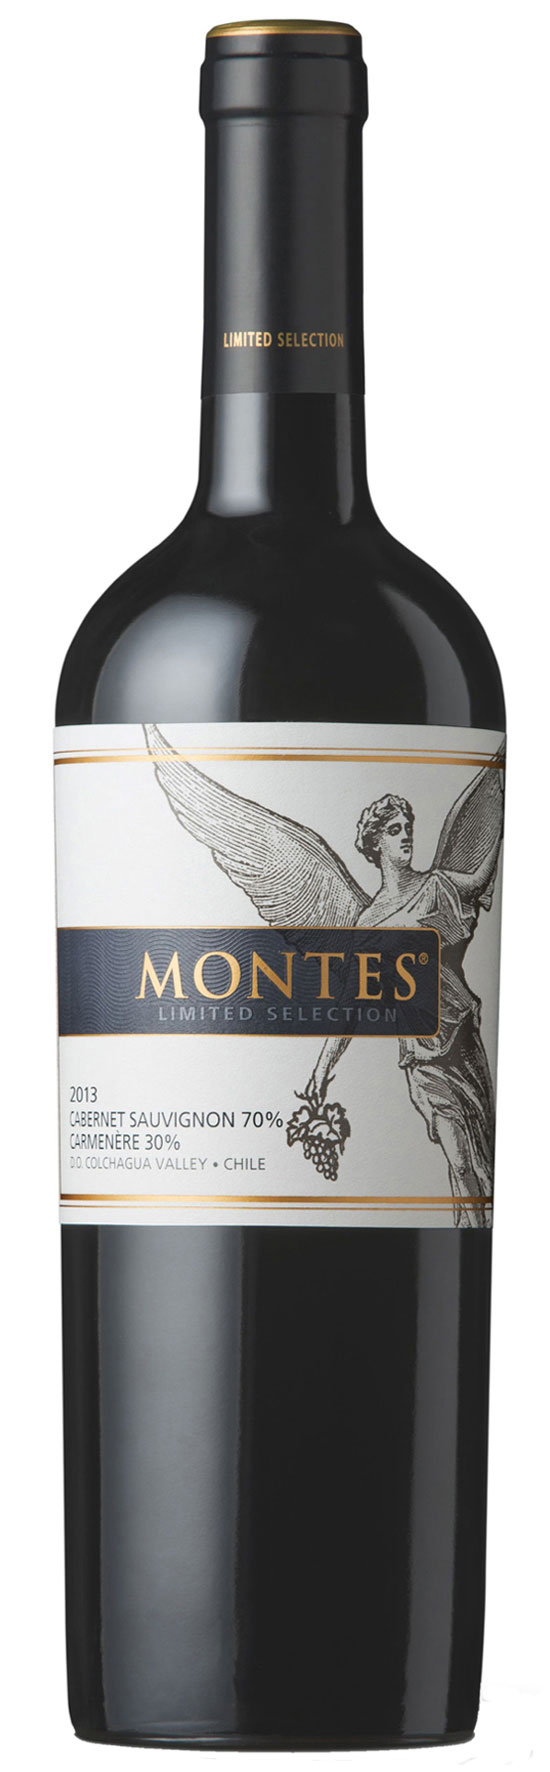 Montes Limited Selection Cabernet Sauvignon Carmenere 2019